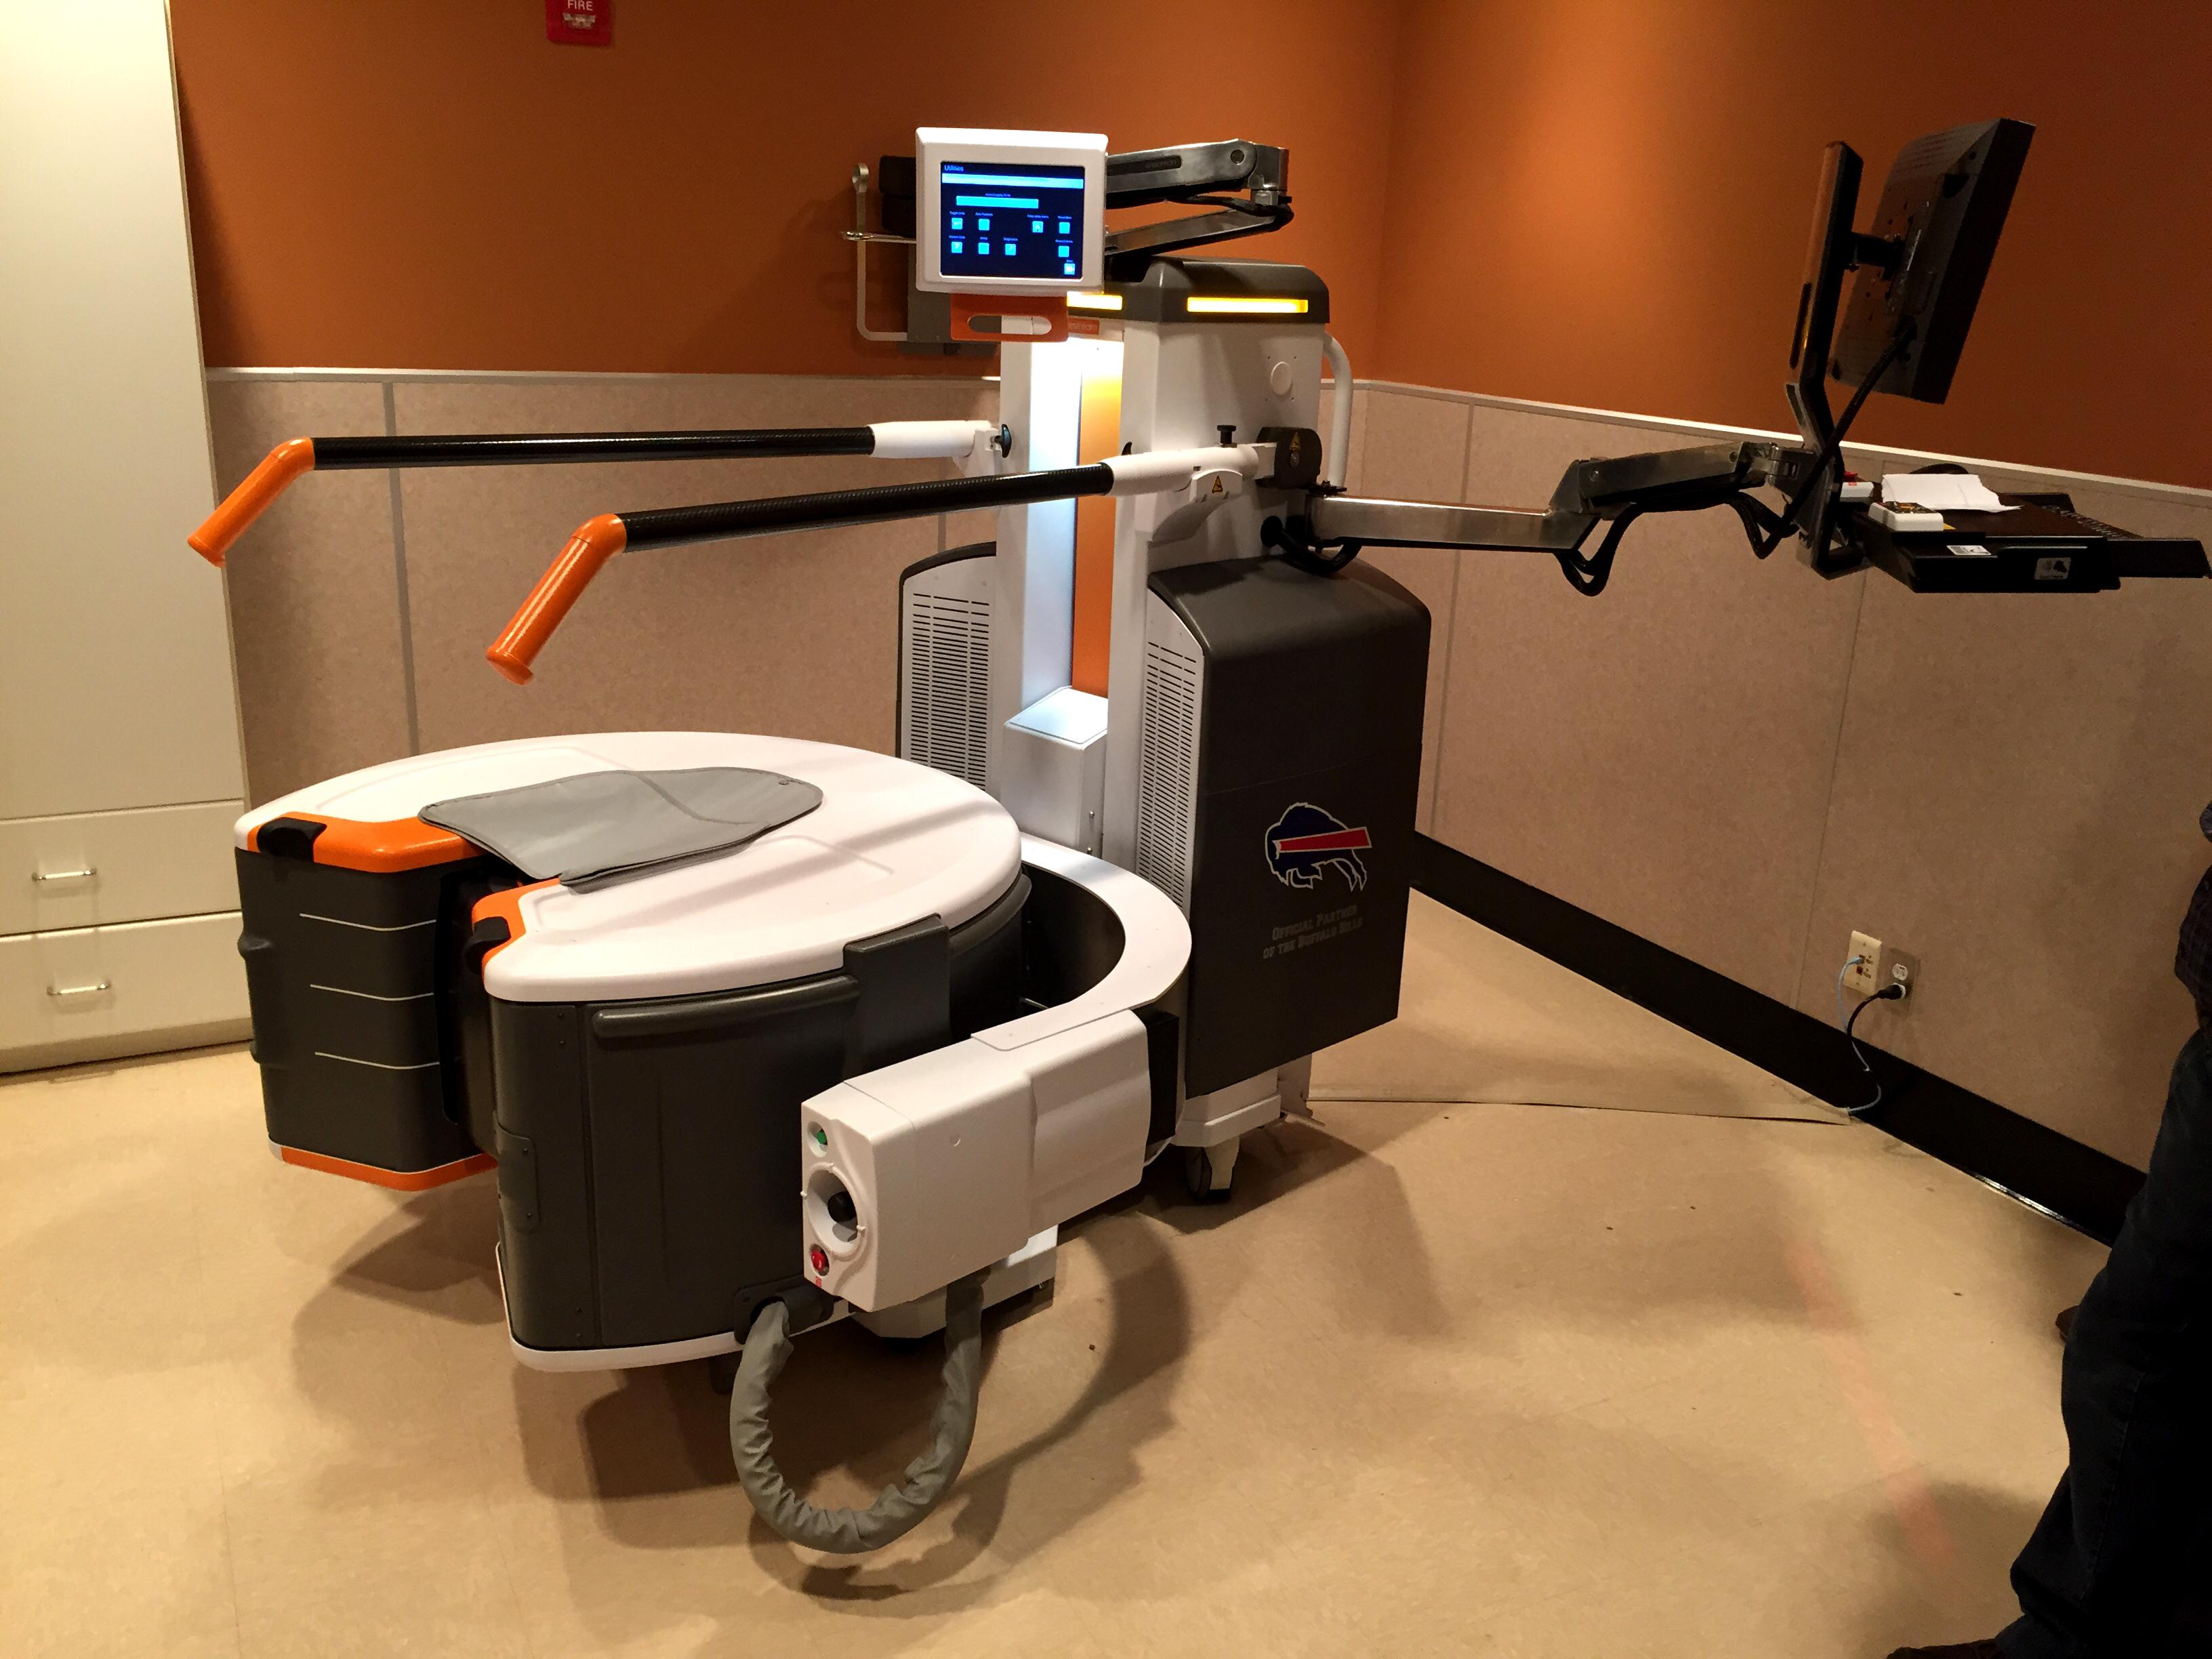 Carestream, UBMD, cone beam CT, CBCT, UBMD Orthopedics, clinical studies